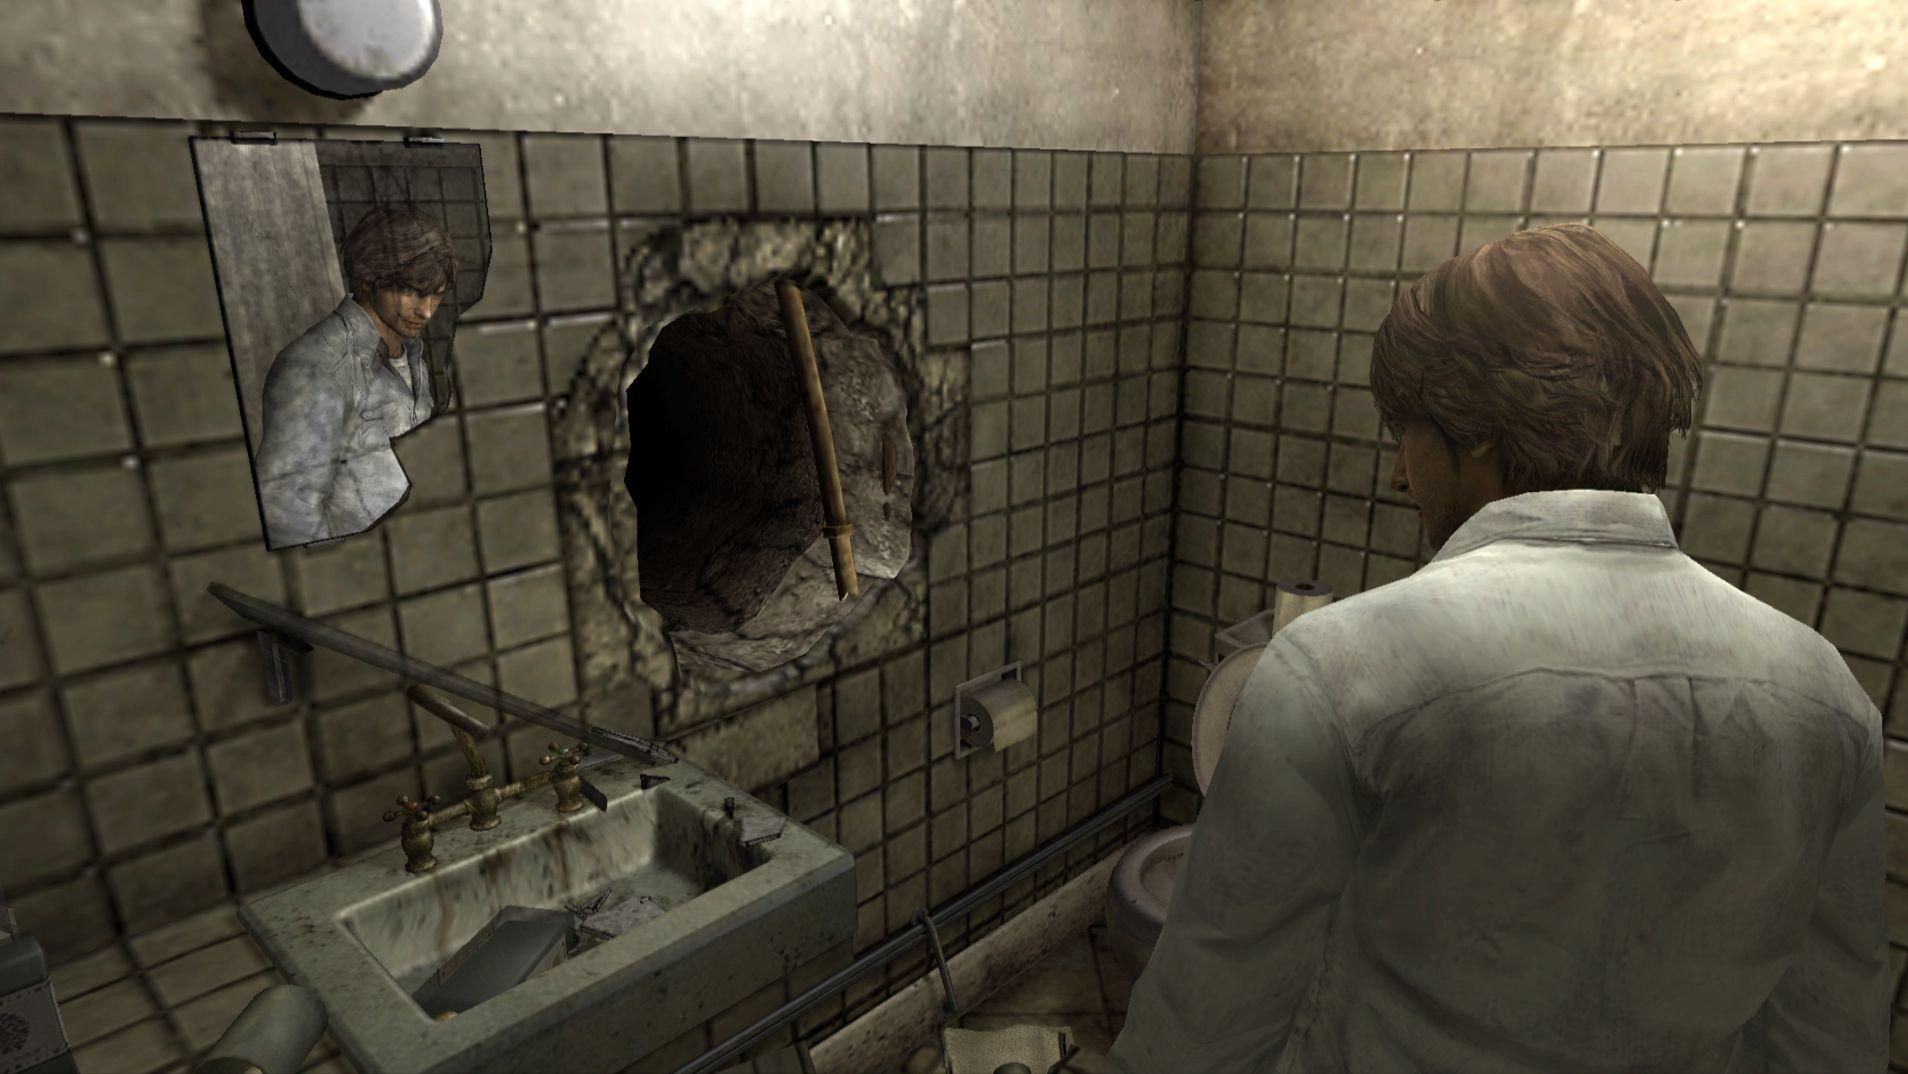 Silent Hill 4 Re-Released on PC Via GOG | Den of Geek